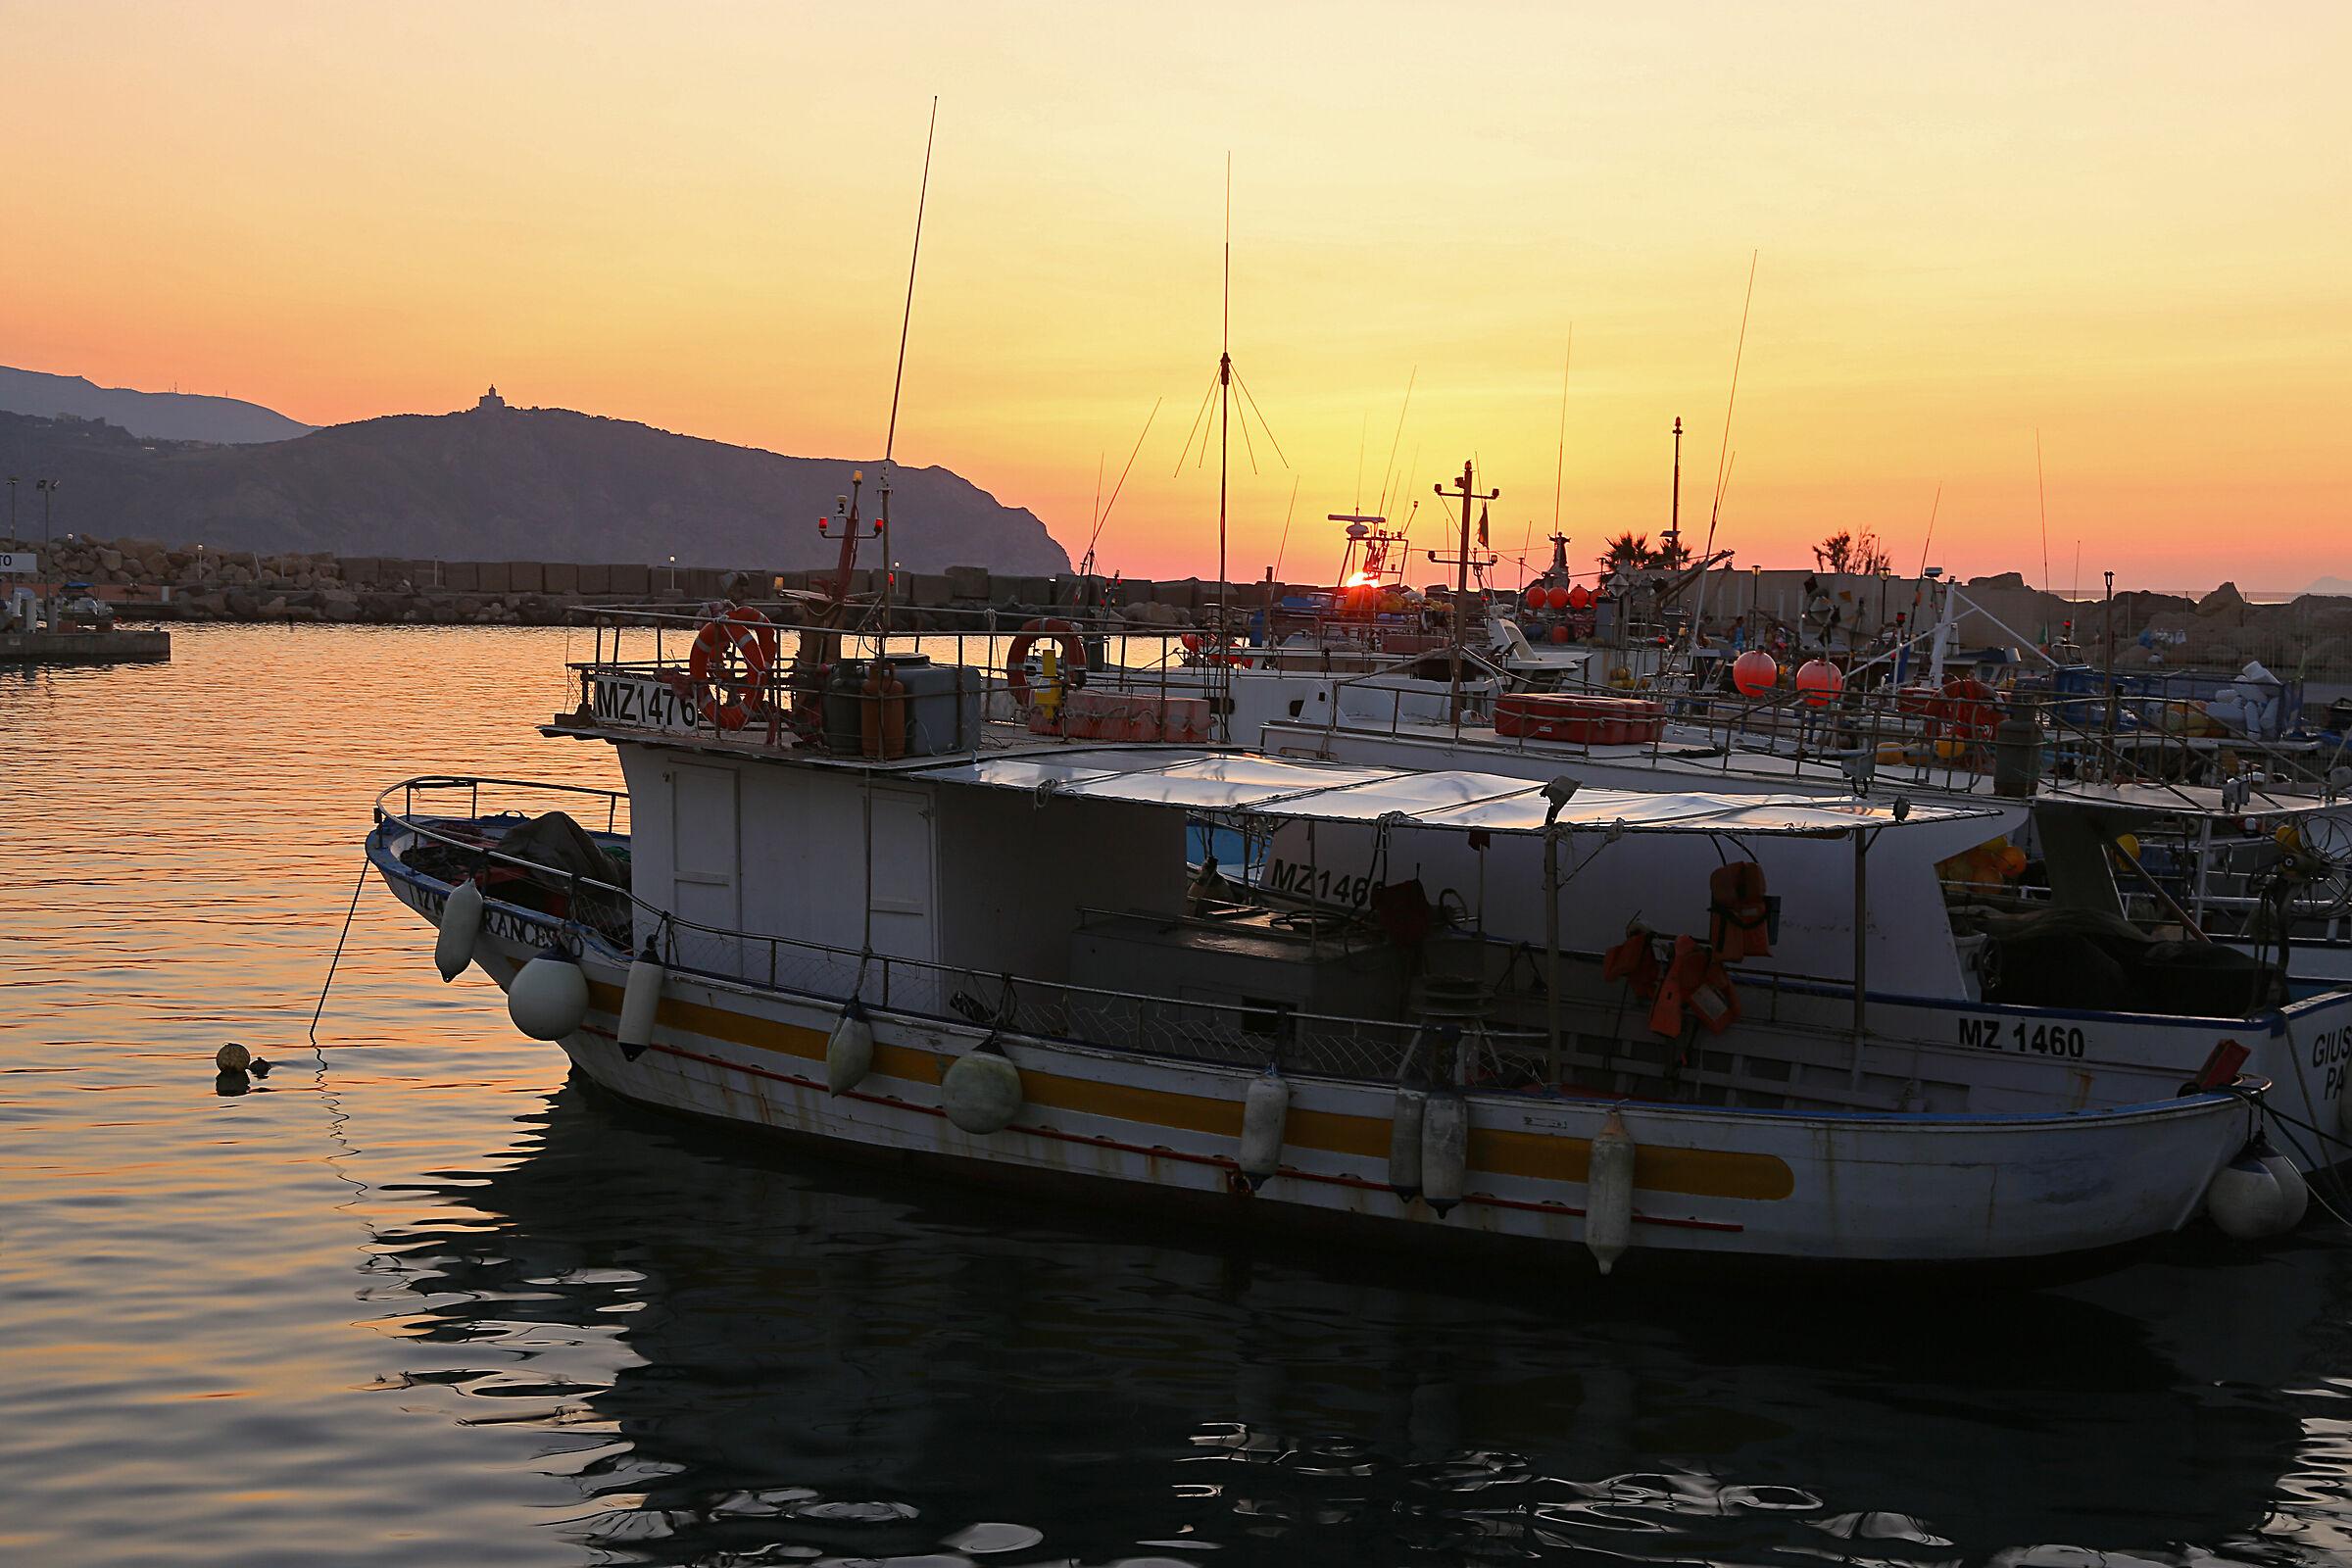 Sunset in port ...